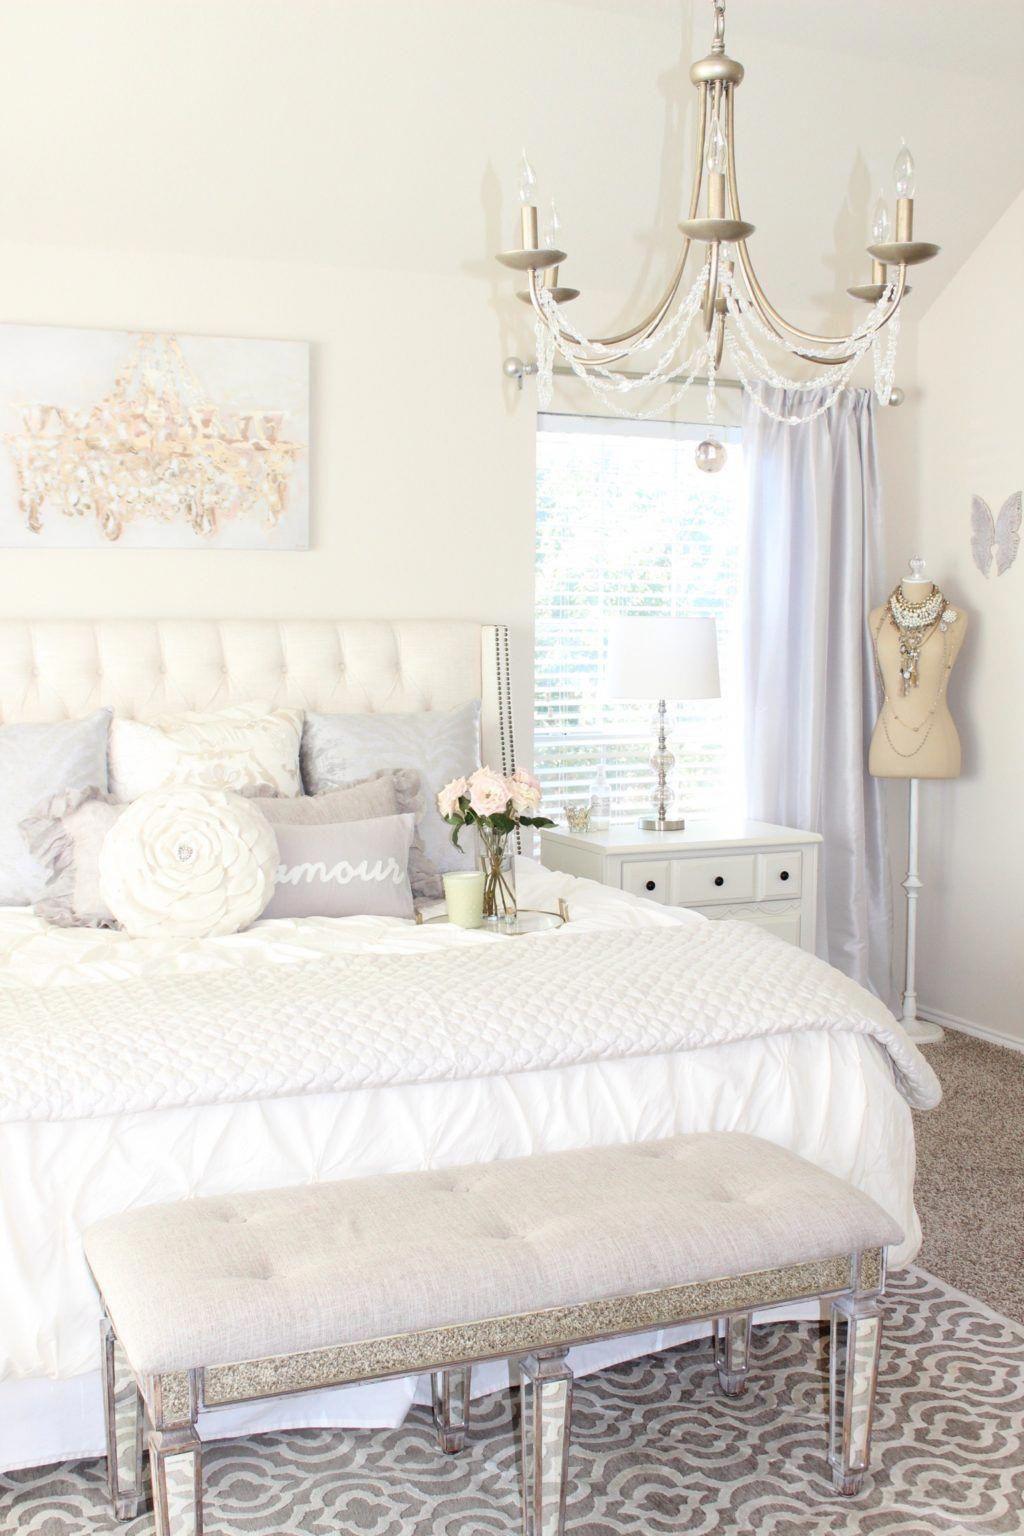 A Dozen Ways To Add Glam To Your Home Summer Adams